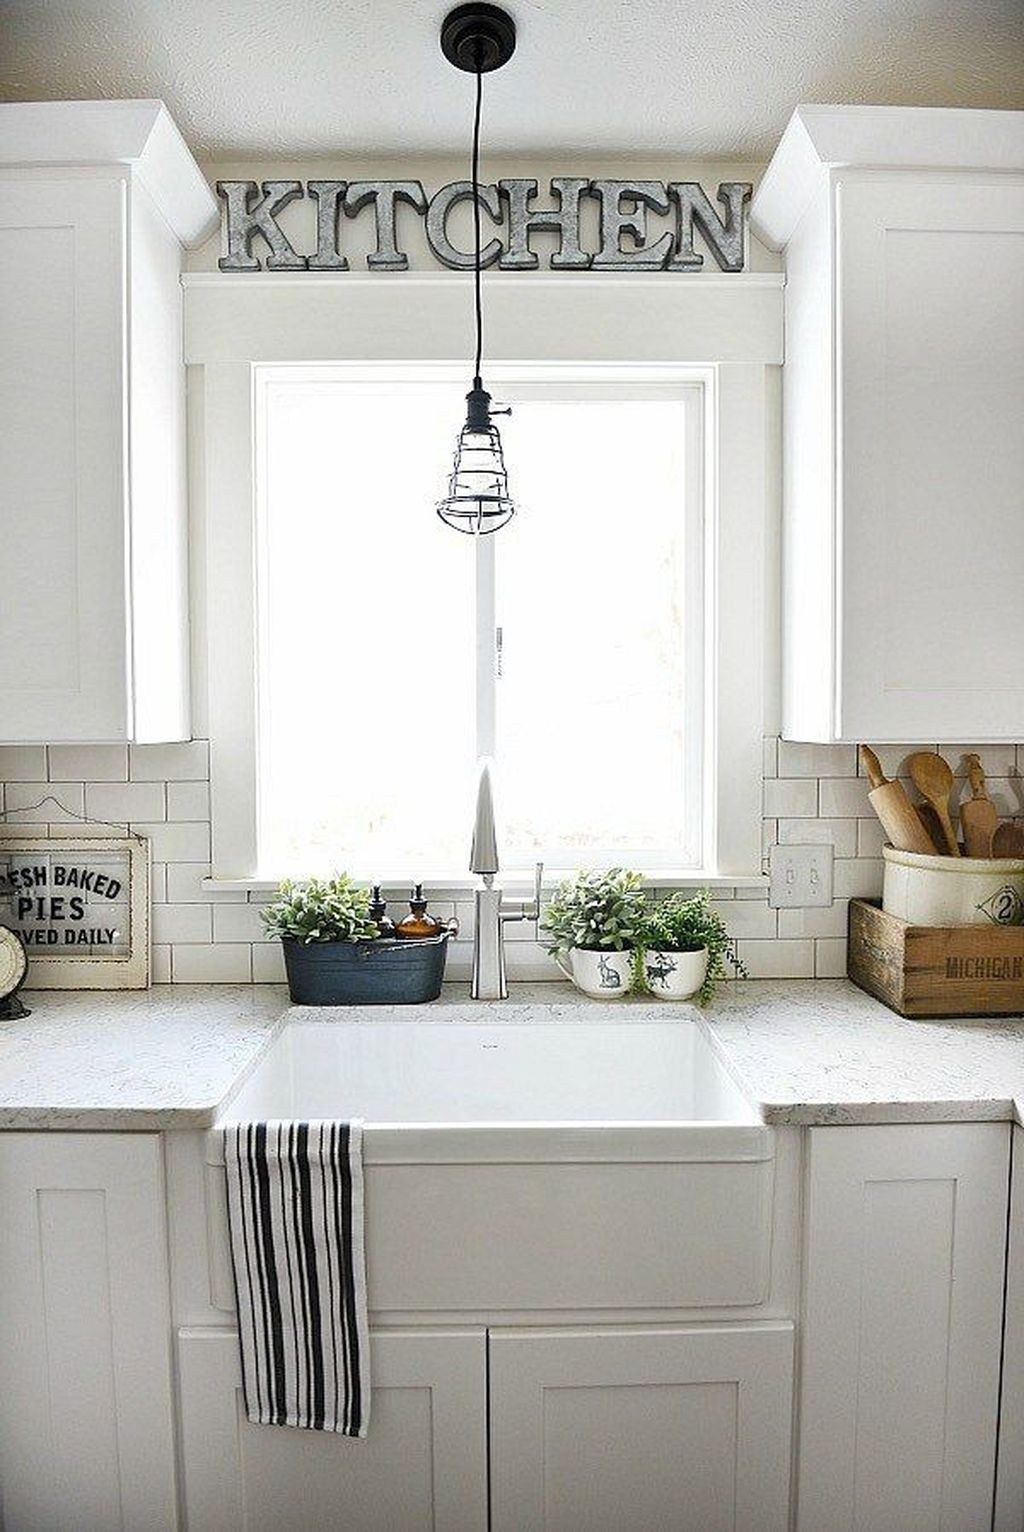 Kitchen with no window   stunning kitchen decoration ideas tips  reno the house